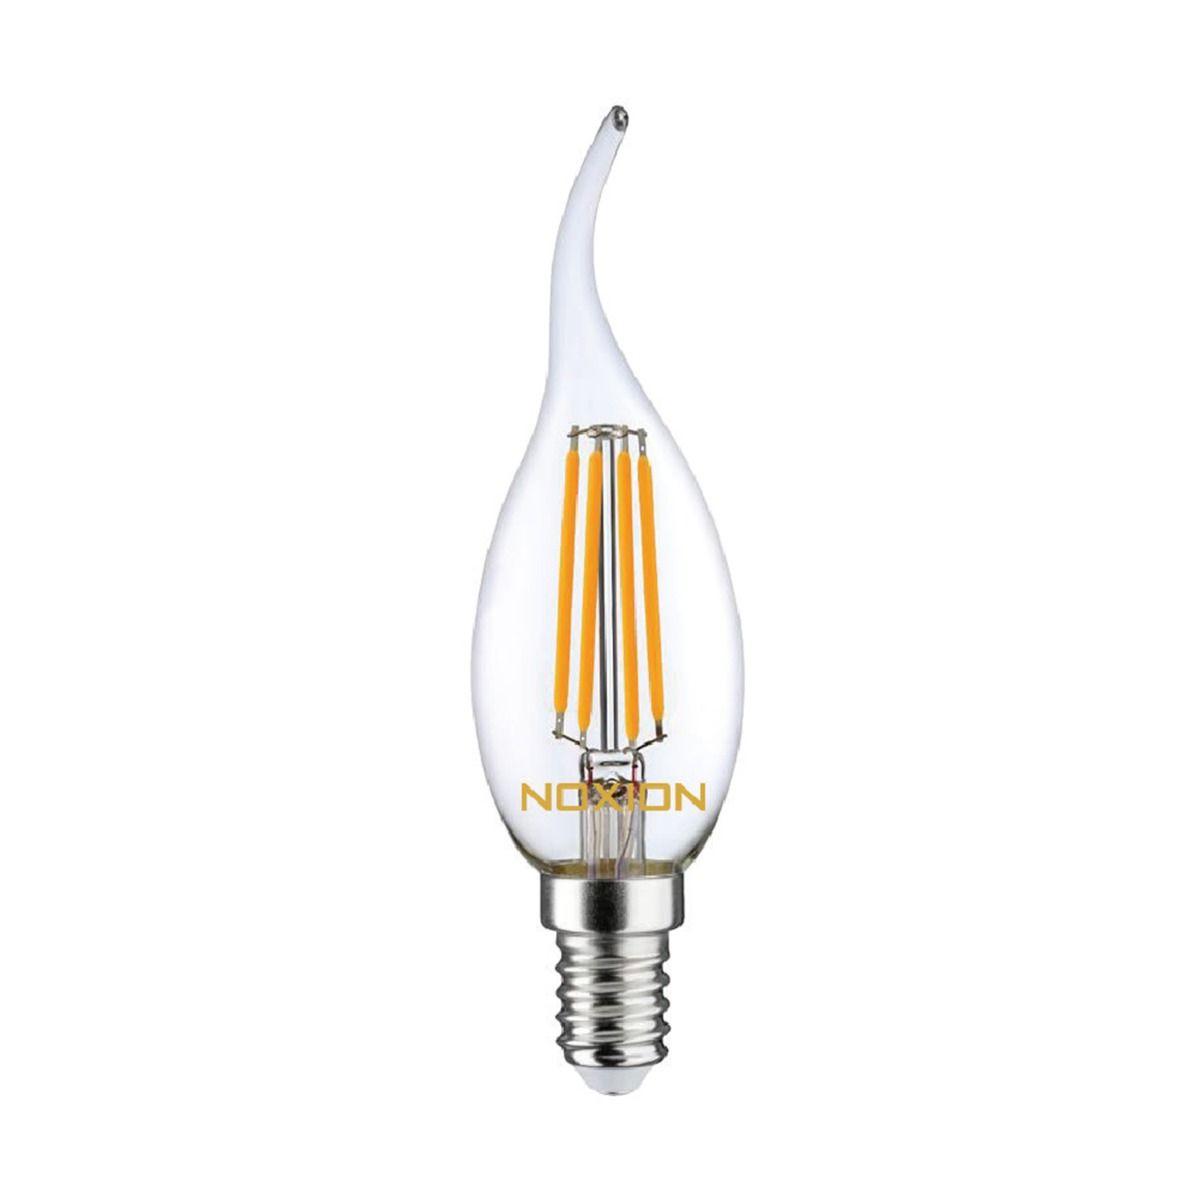 Noxion Lucent Filament LED Candle 4.5W 827 BA35 E14 Kirkas   Himmennettävä - Erittäin Lämmin Valkoinen - Korvaa 40W